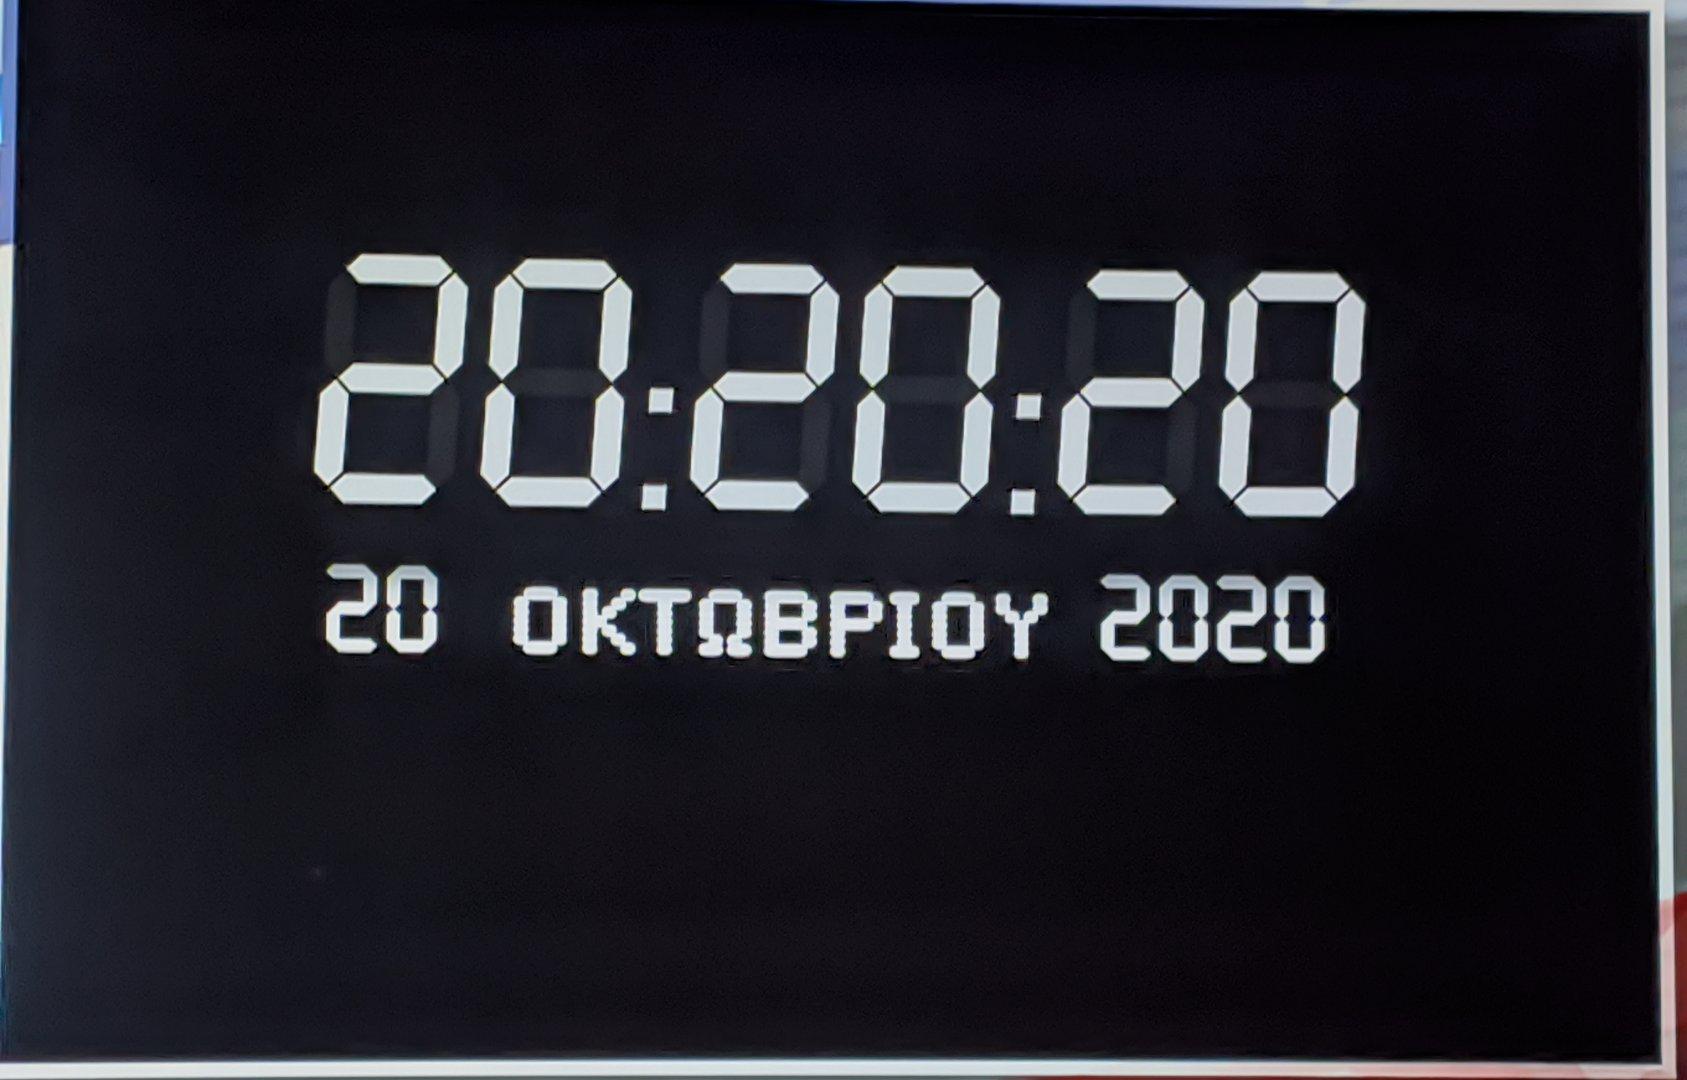 IMG_20201020_202844.jpg